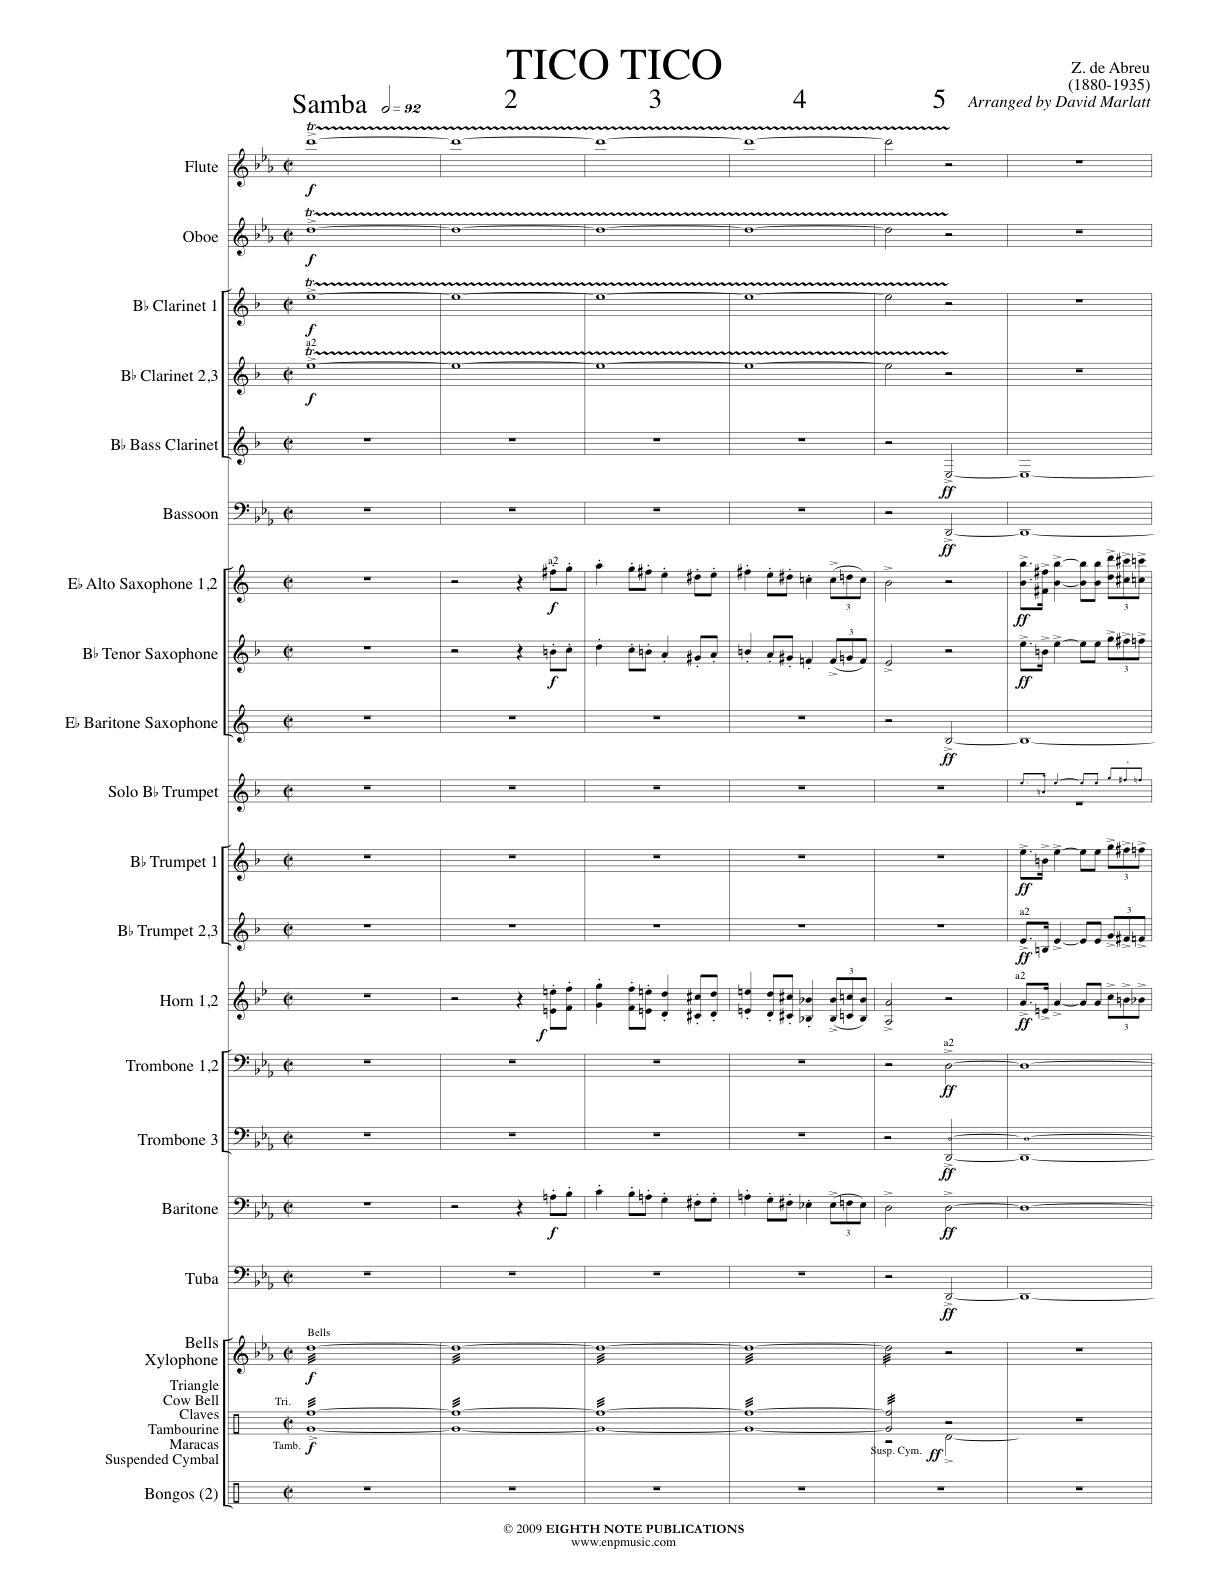 Tico Tico - Solo Trumpet and Band - Zequinha de Abreu